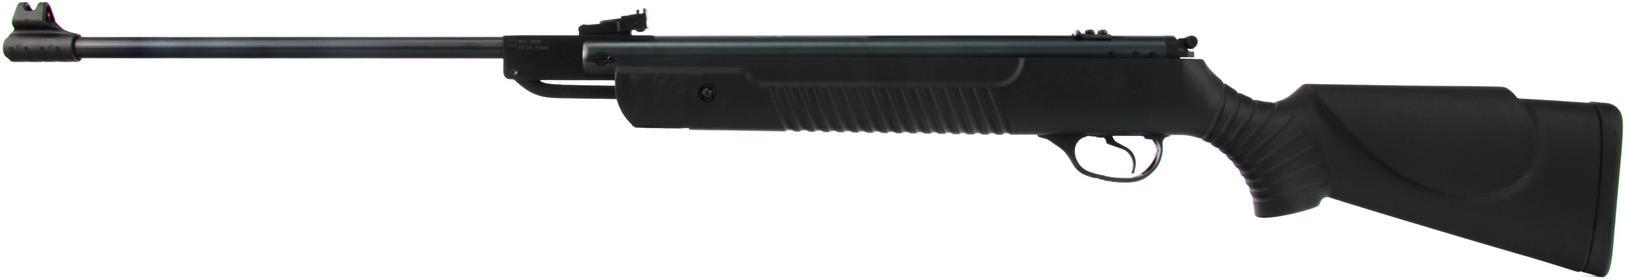 Hatsan Wiatrówka 80 STG SAS Quattro Trigger 5.5 mm 053-054